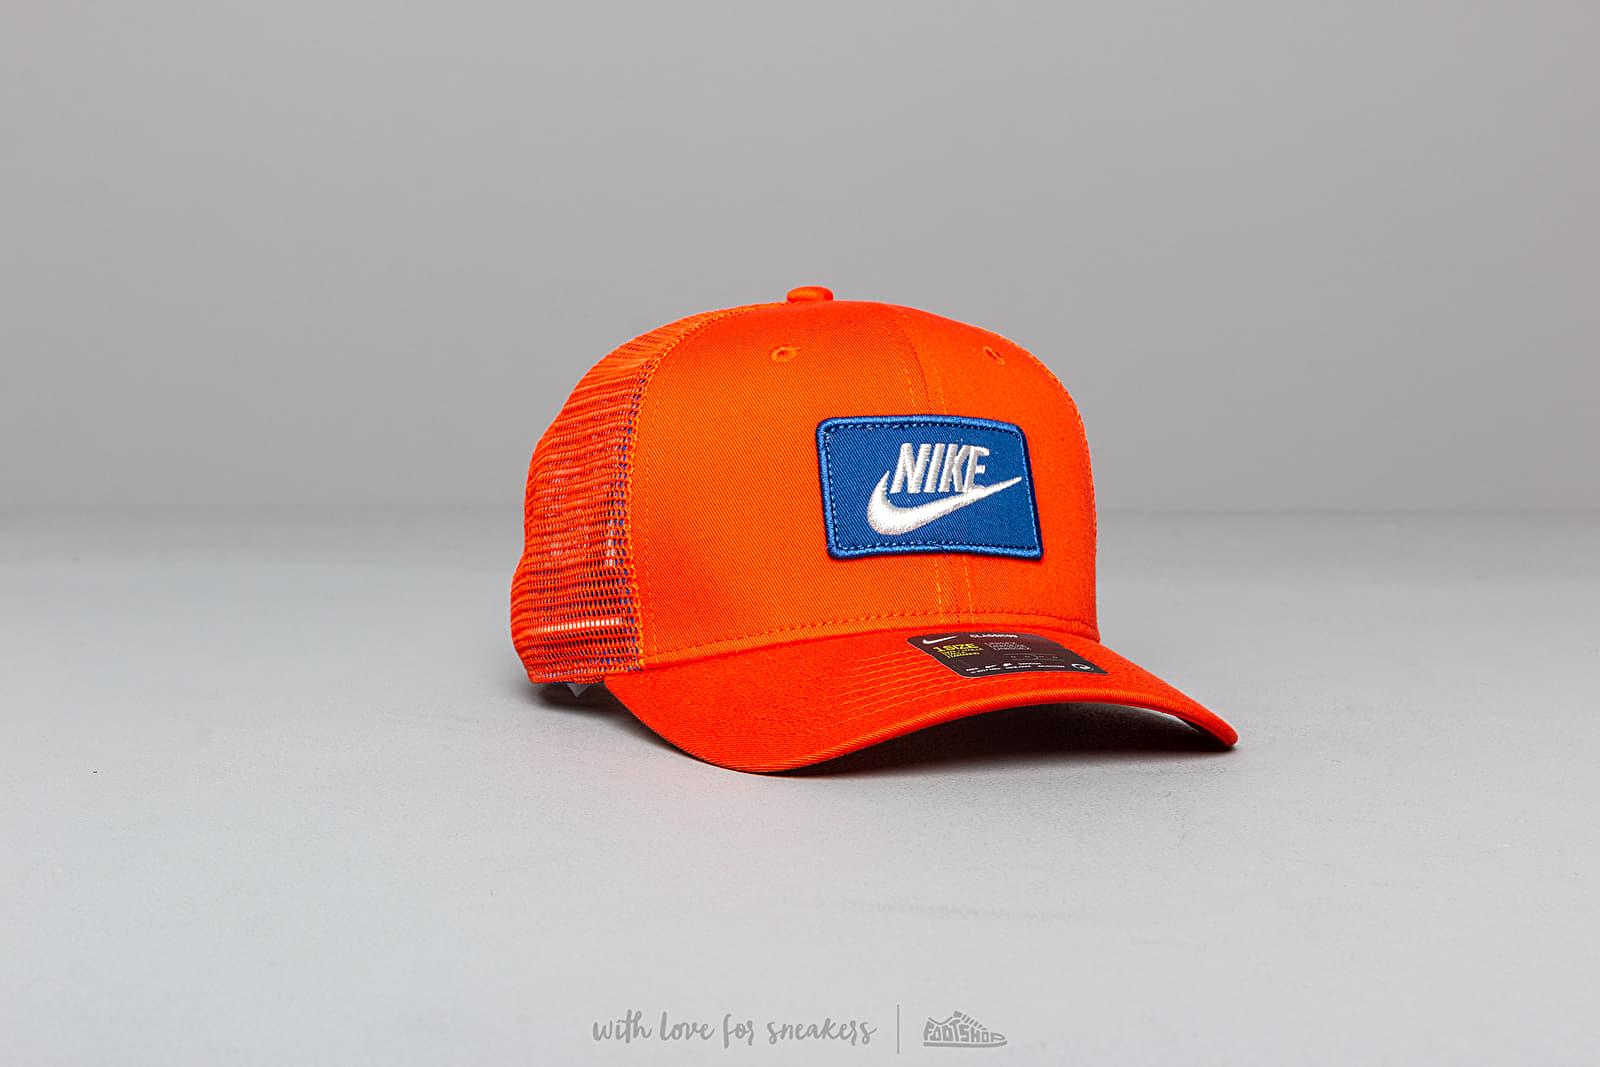 Nike Sportswear CLC 99 Cap Trucker Team Orange